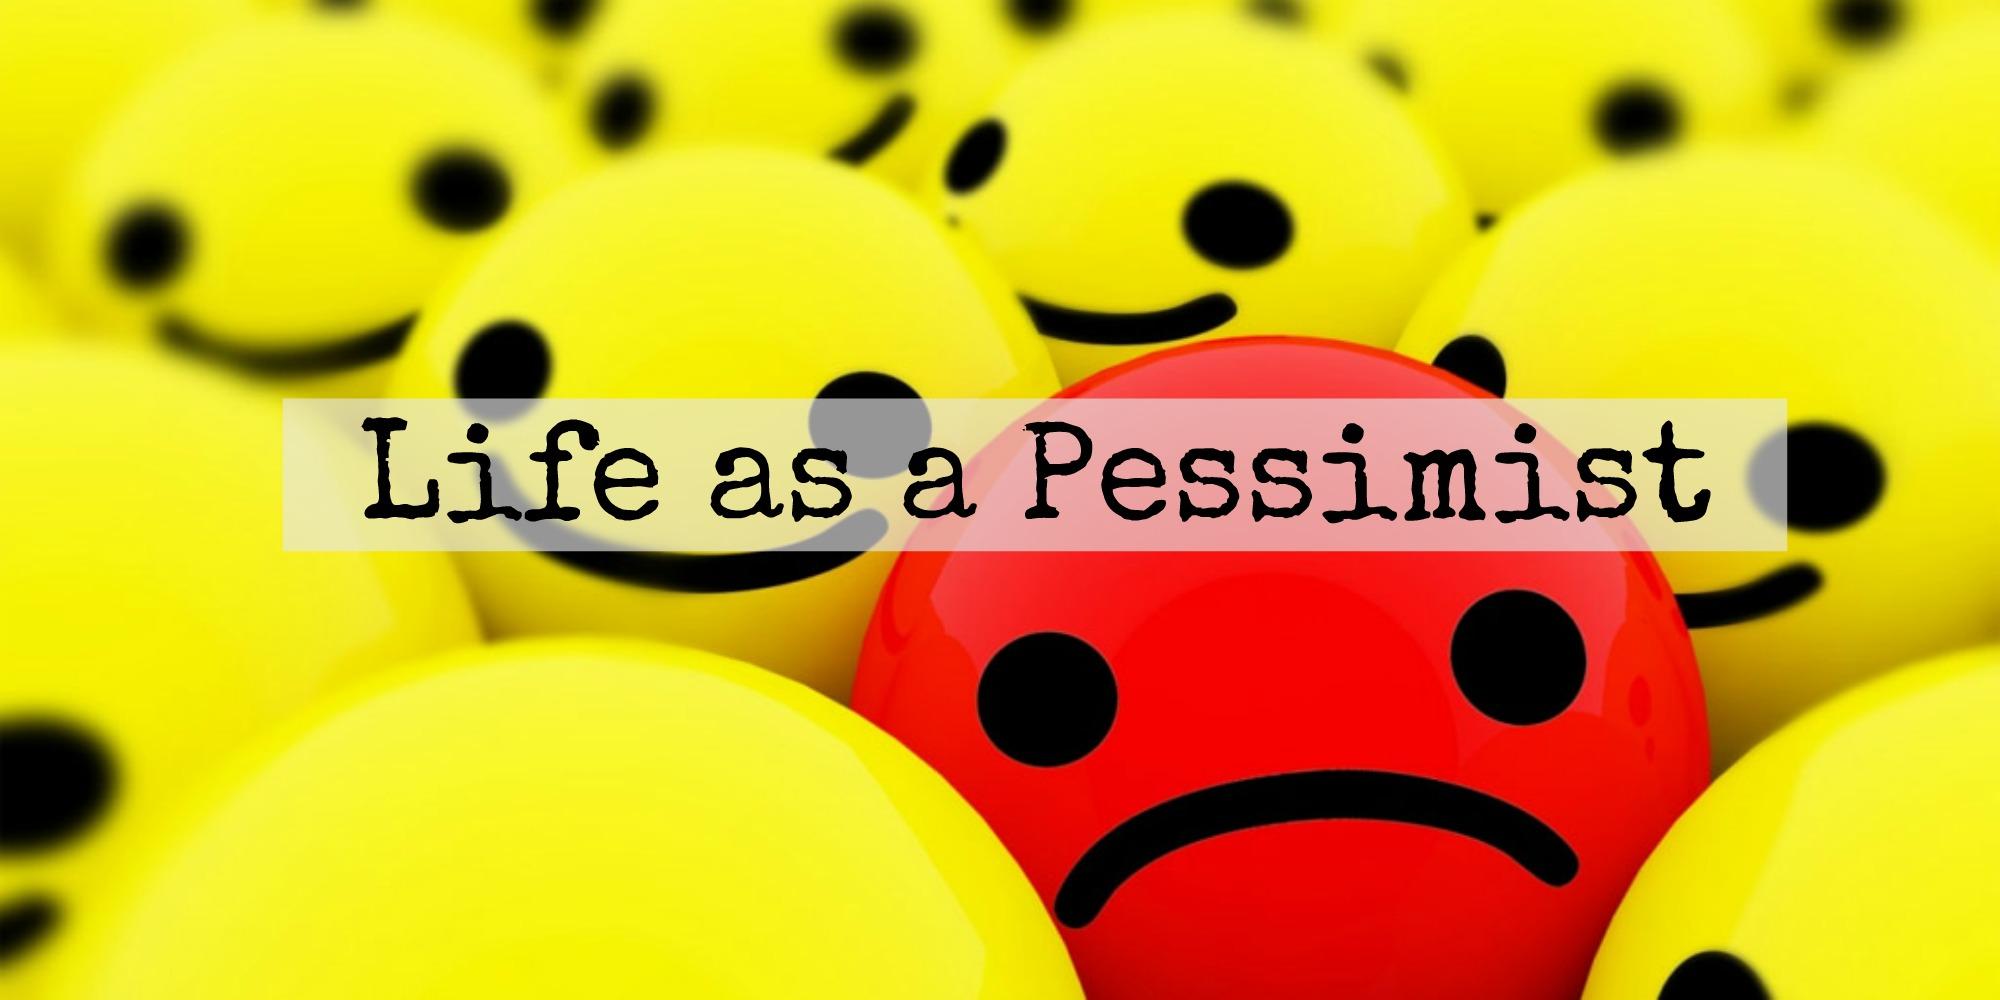 Life as a pessimist